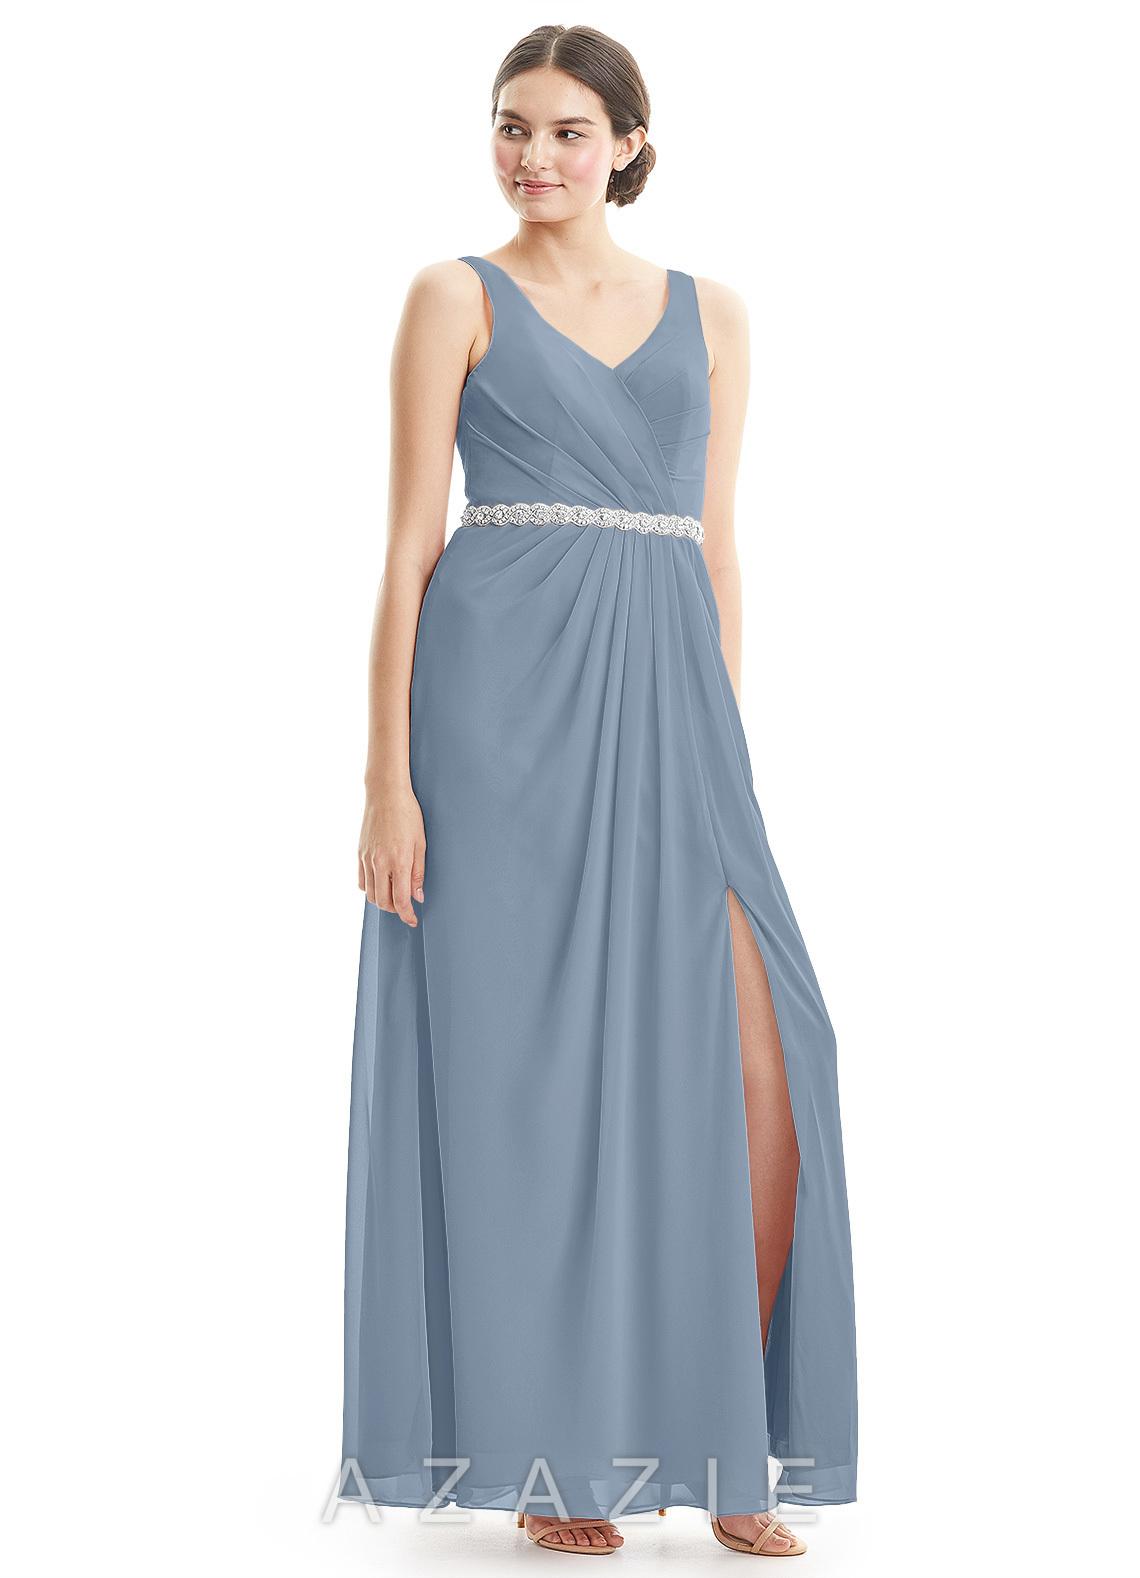 806cd90a569 Azazie Jocelyn Bridesmaid Dress